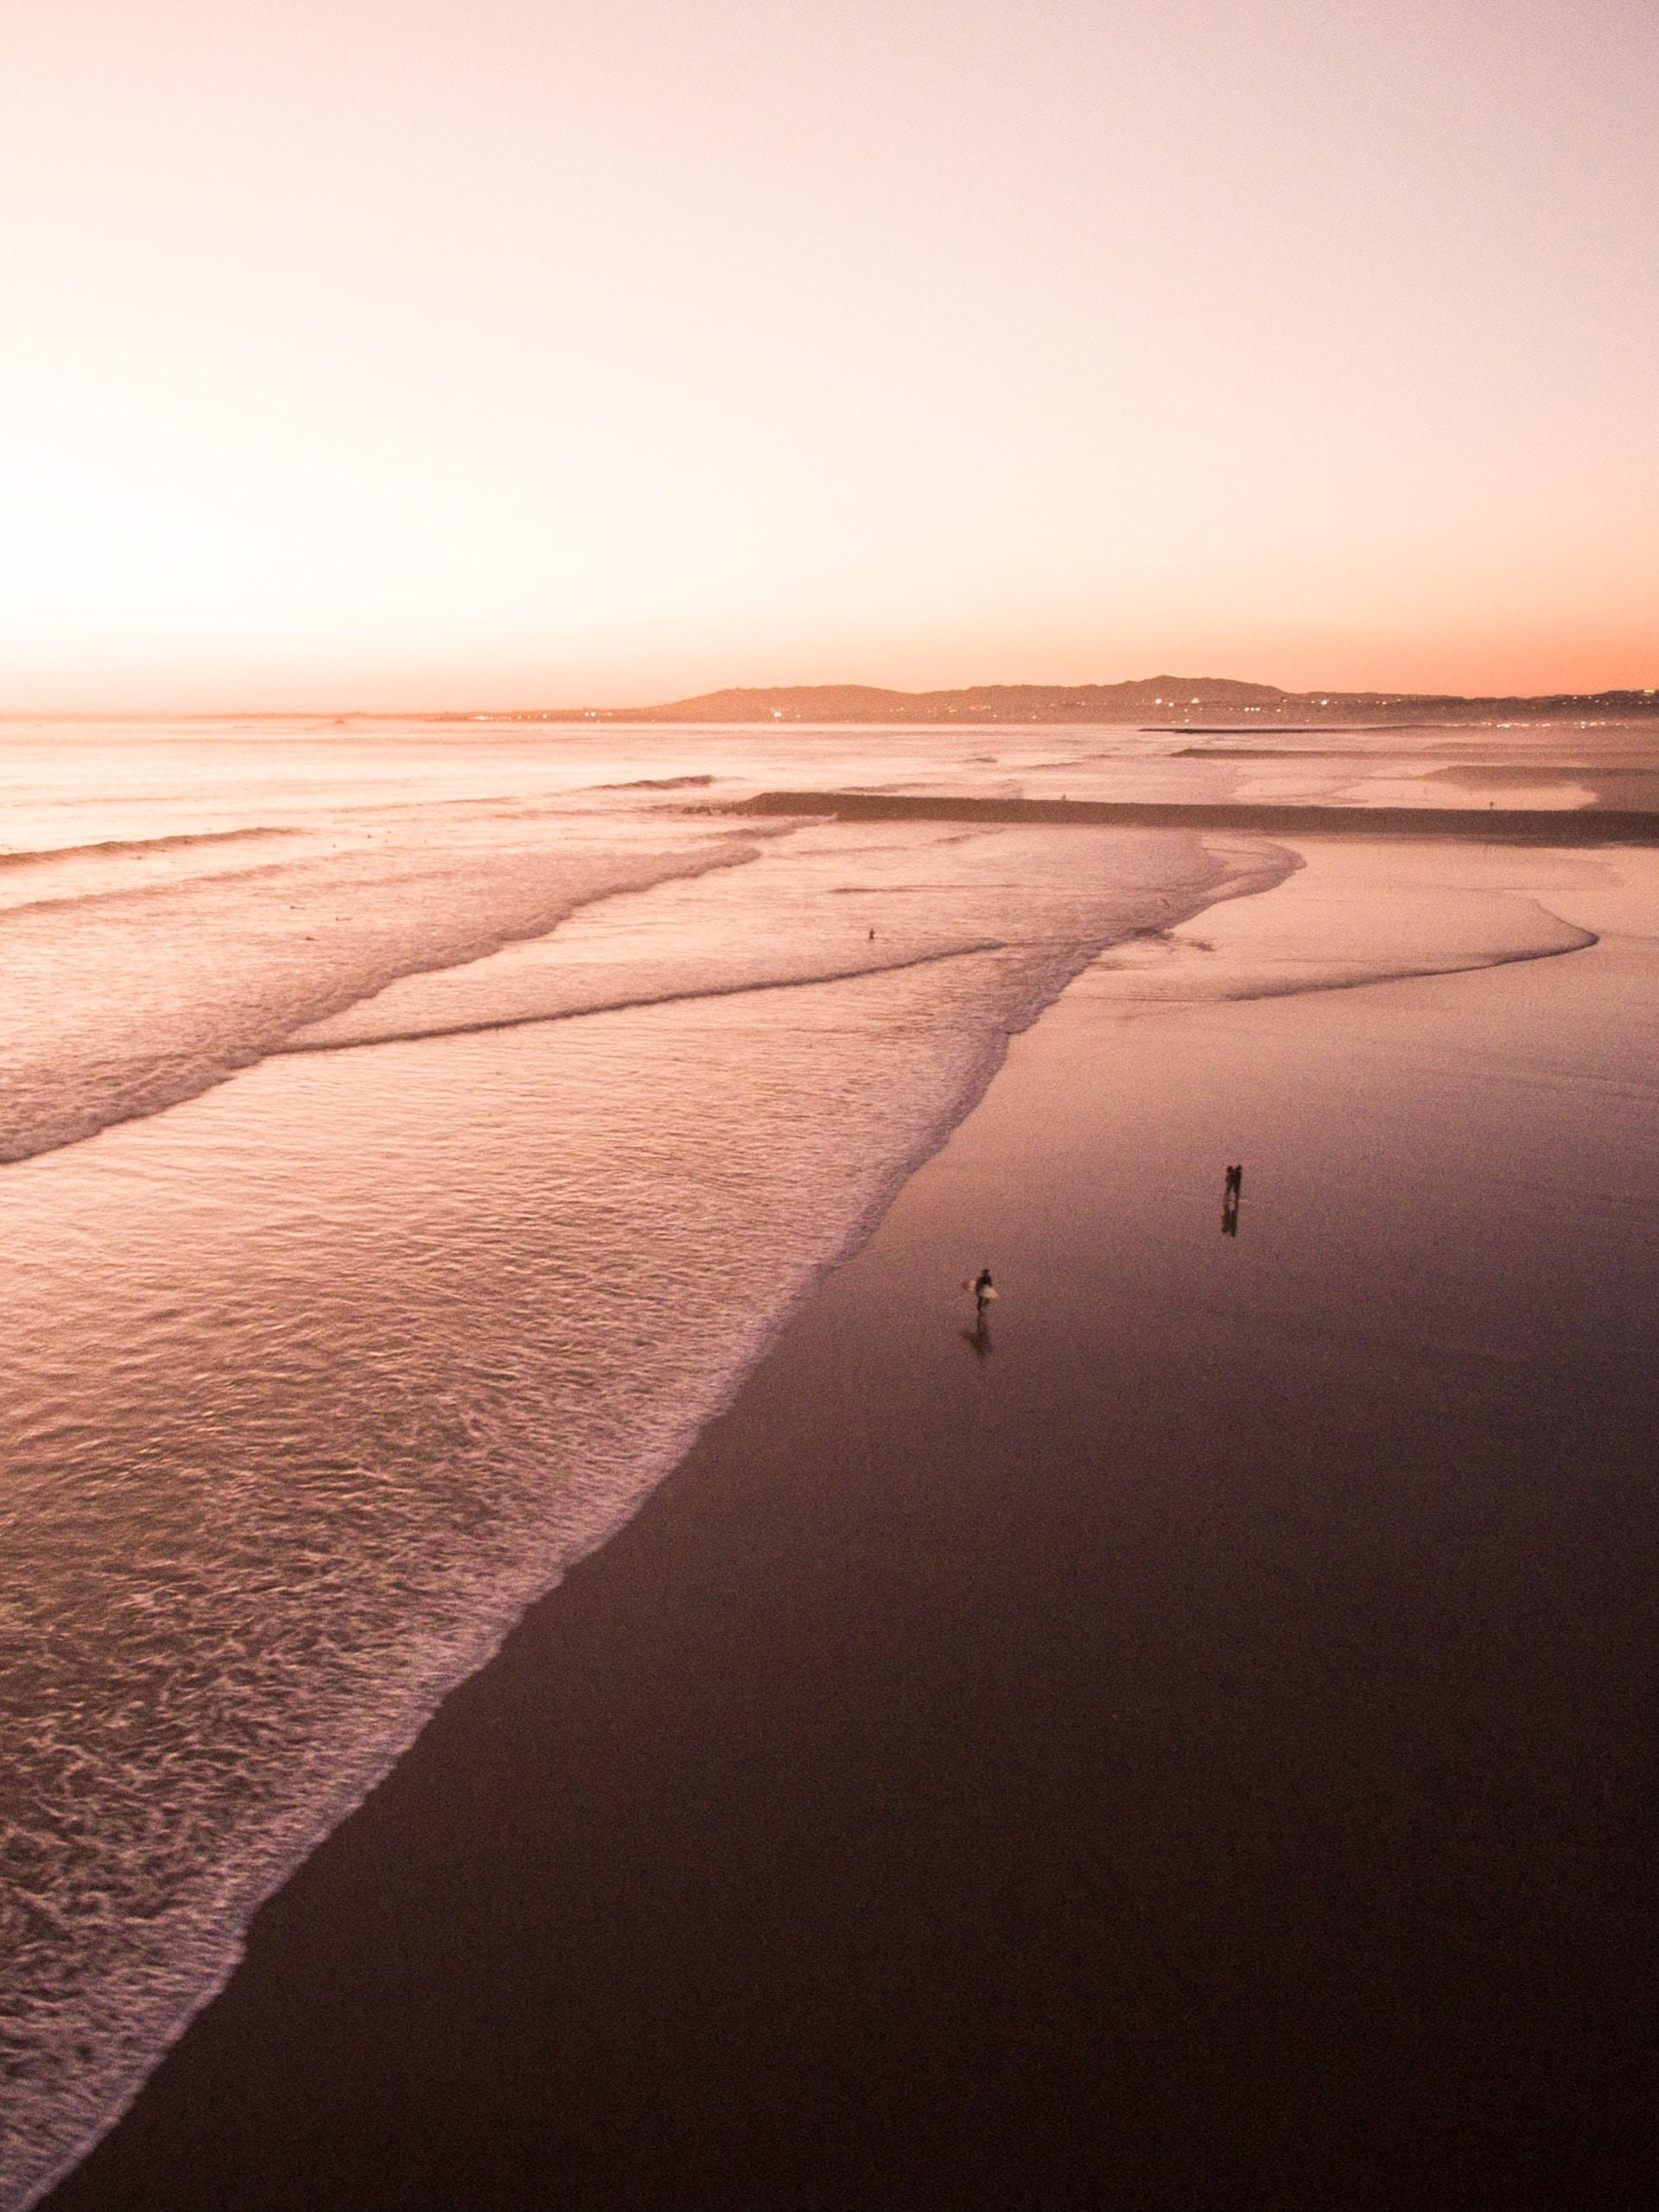 person walking beside beach during daytime